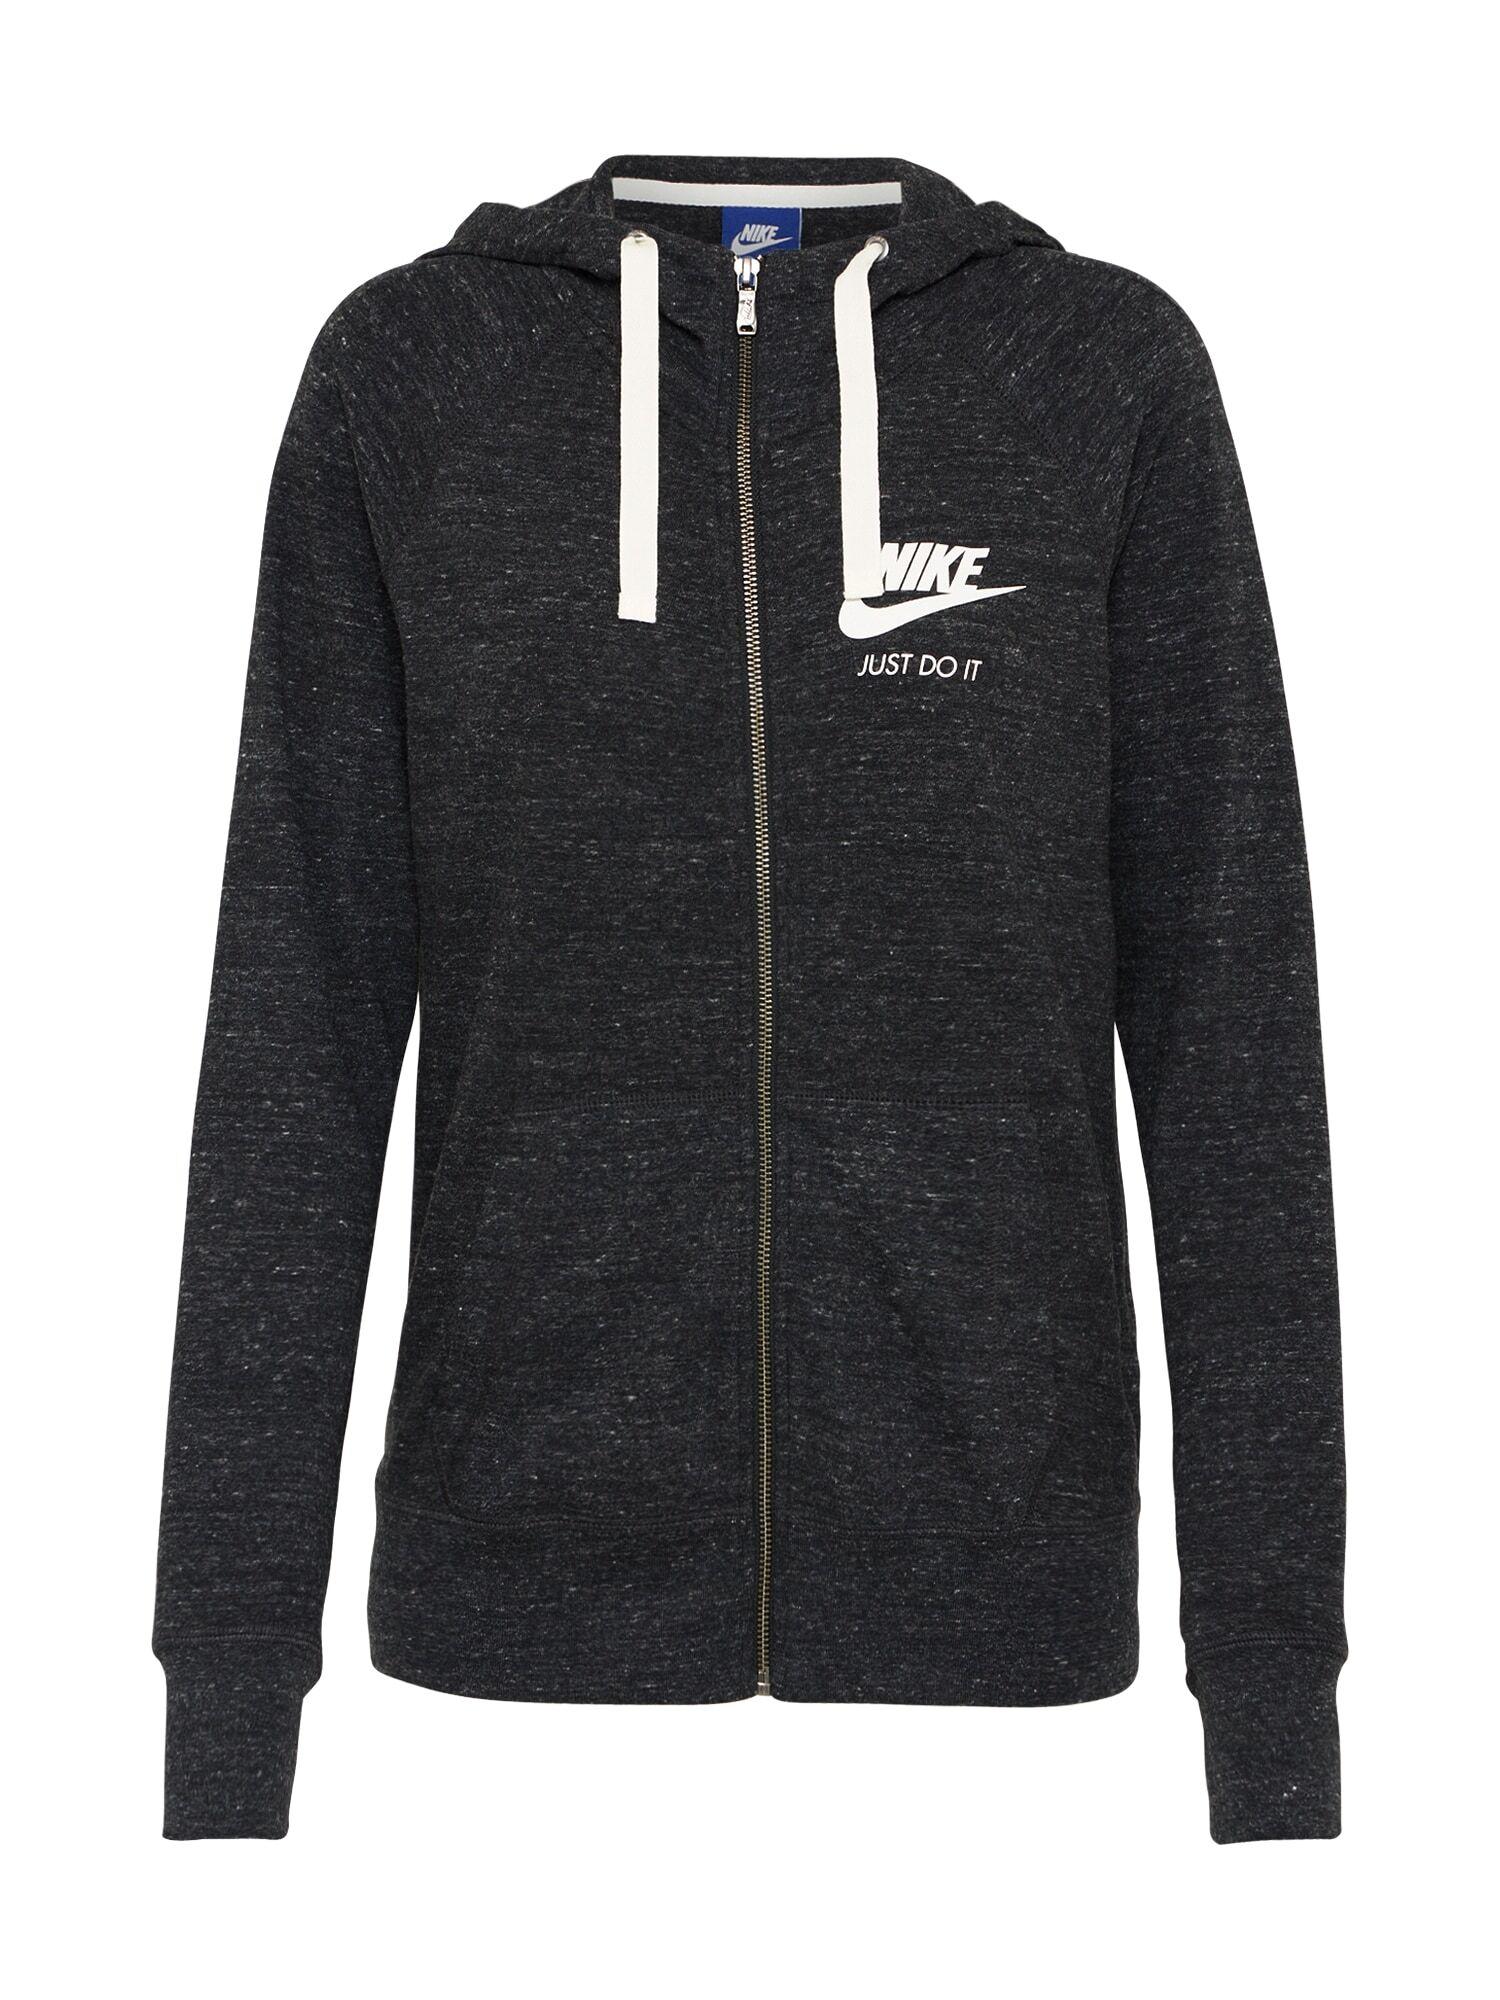 Nike Sportswear Sweatjacke XS,S,M,L,XL